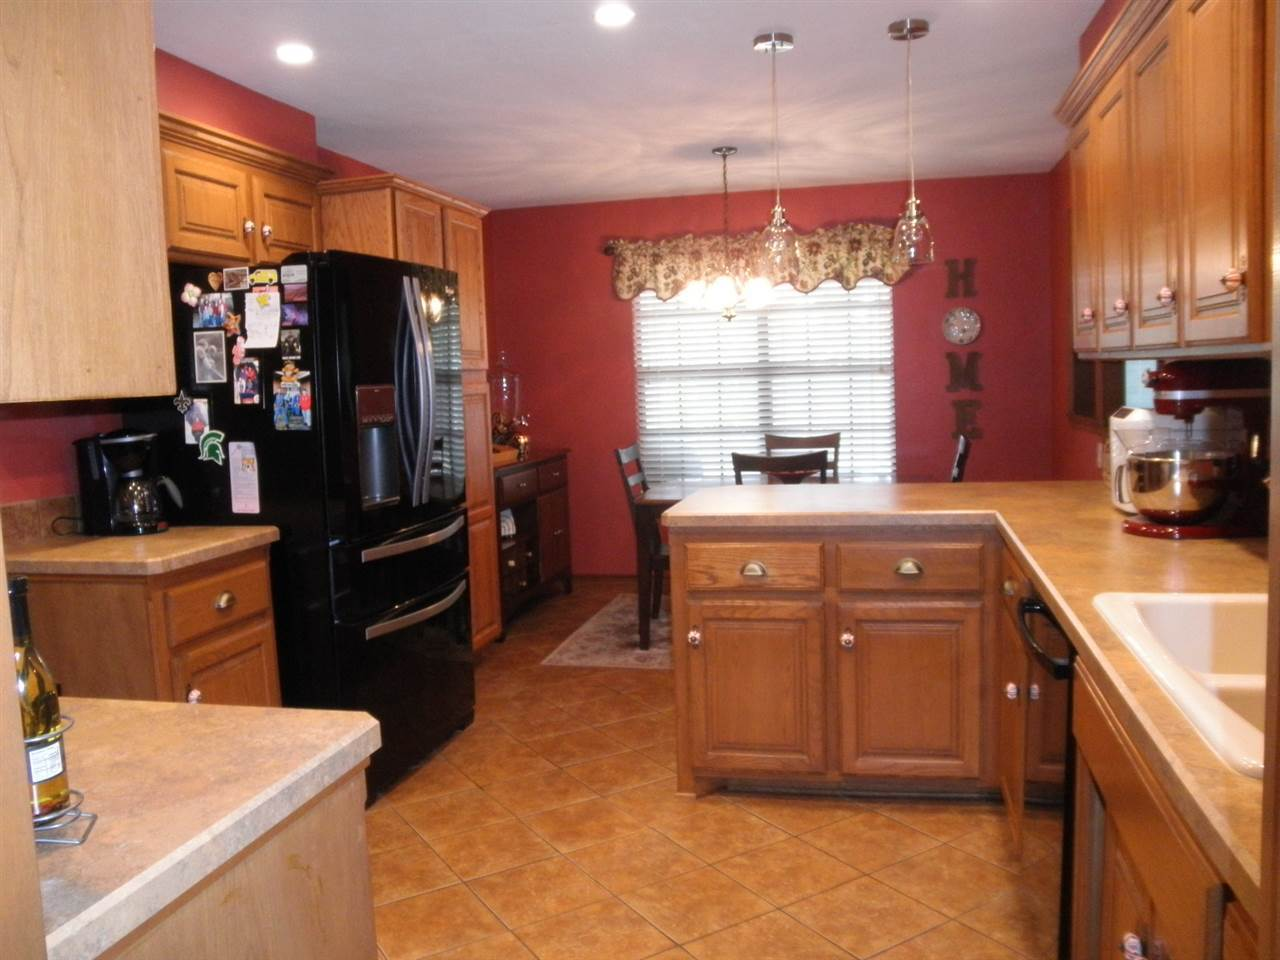 Sold Intraoffice W/MLS | 2800 Green Meadow Ponca City, OK 74604 10